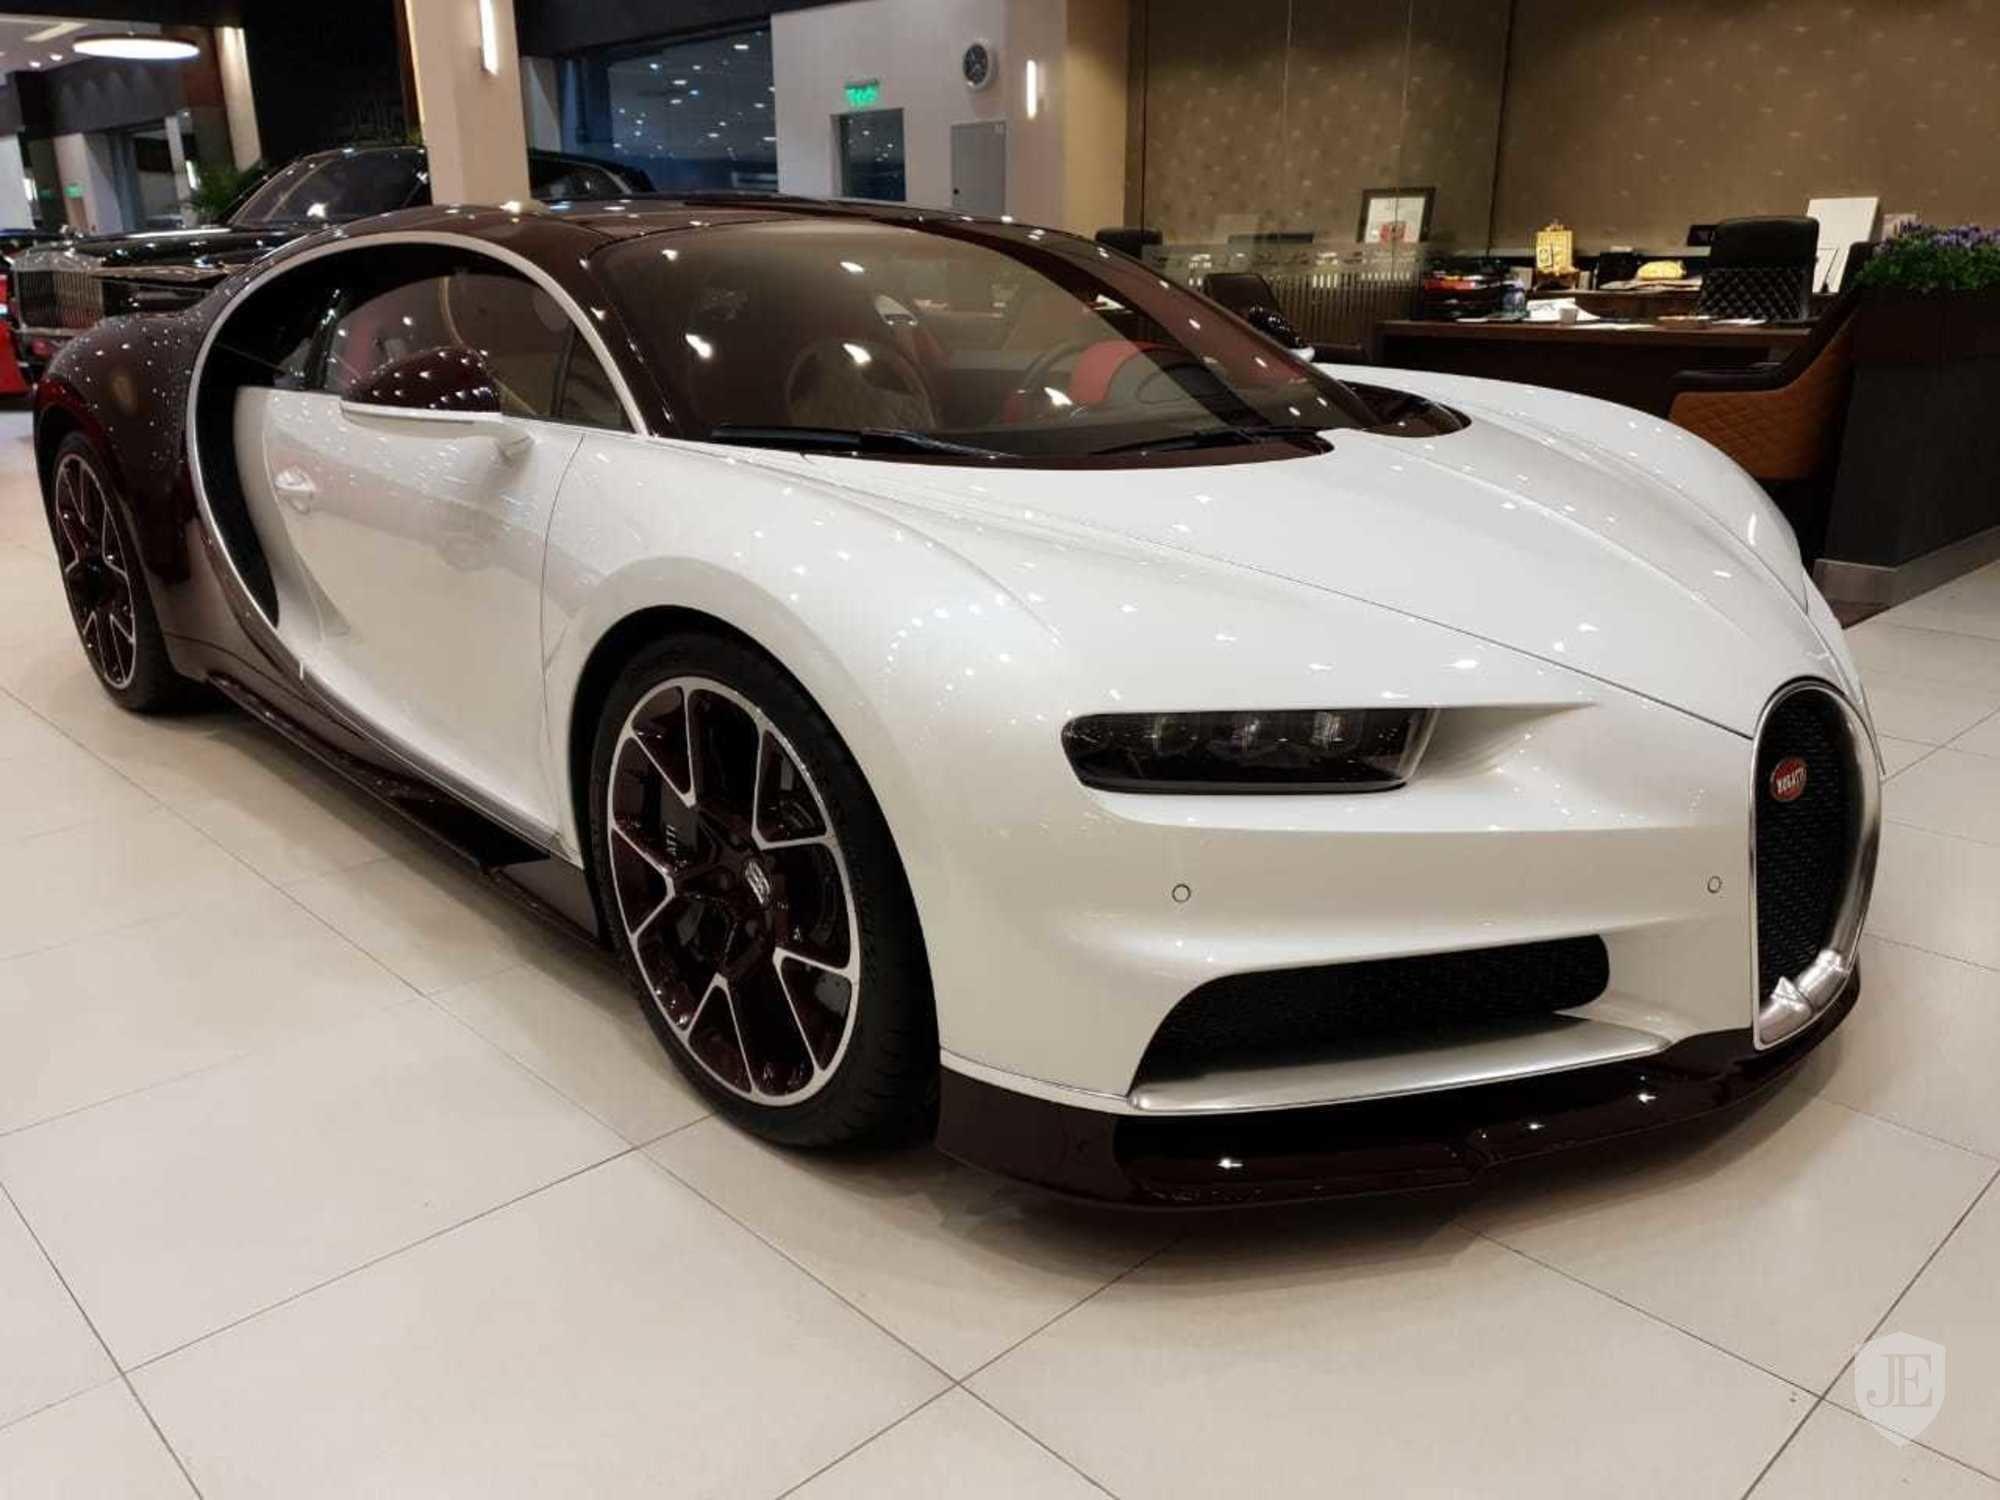 2017 Bugatti Chiron For Sale On Jamesedition Bugatti Chiron Bugatti Bugatti Chiron 2017